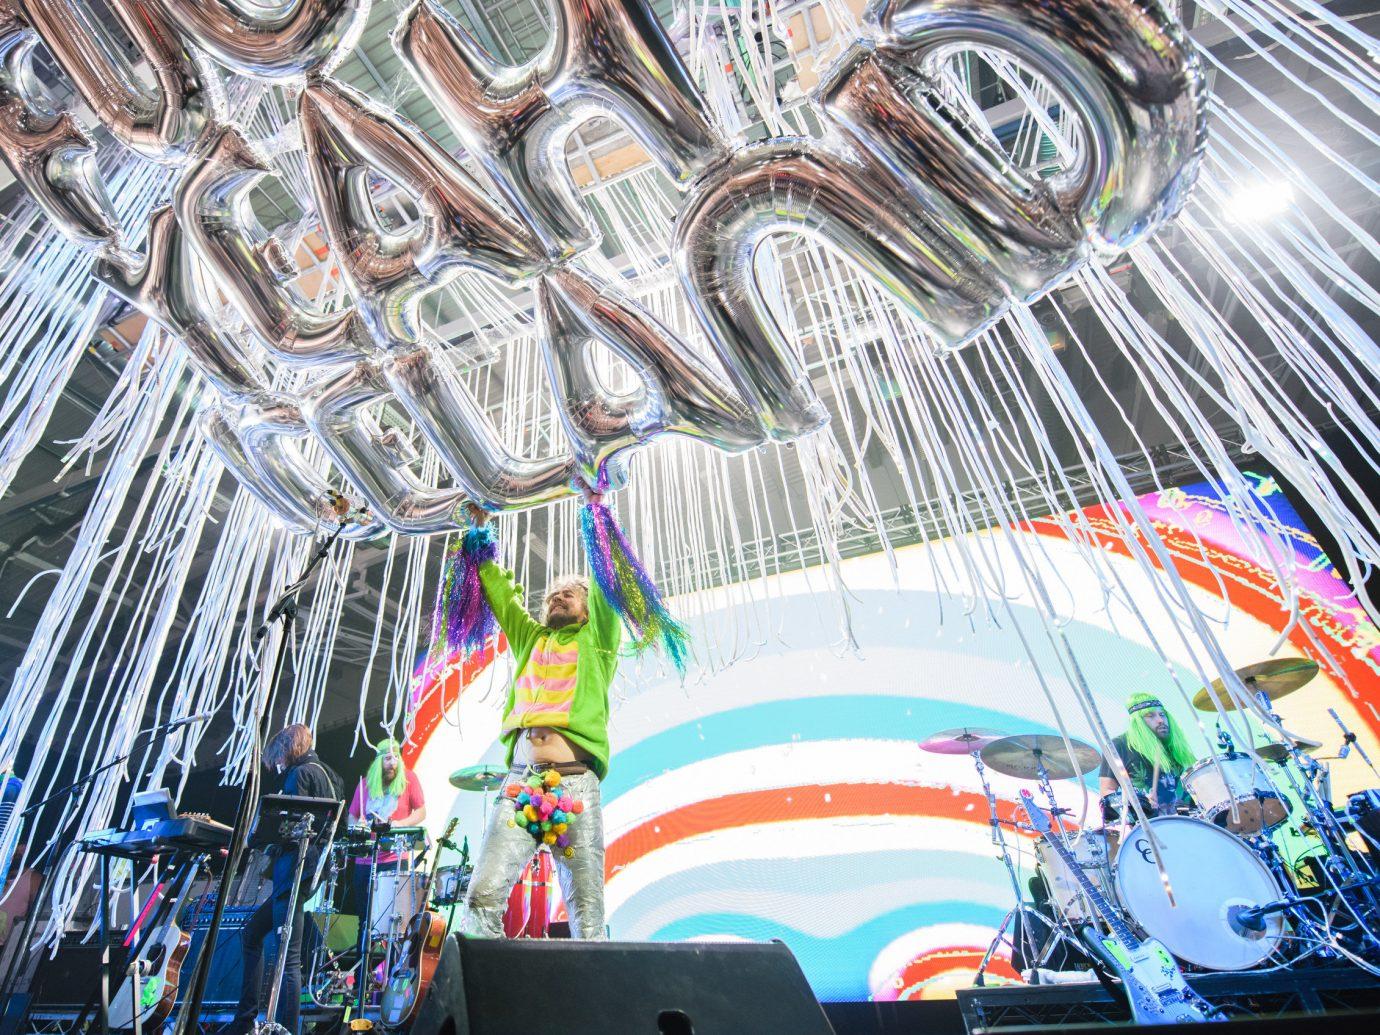 Arts + Culture crowd metropolis City urban area art colorful